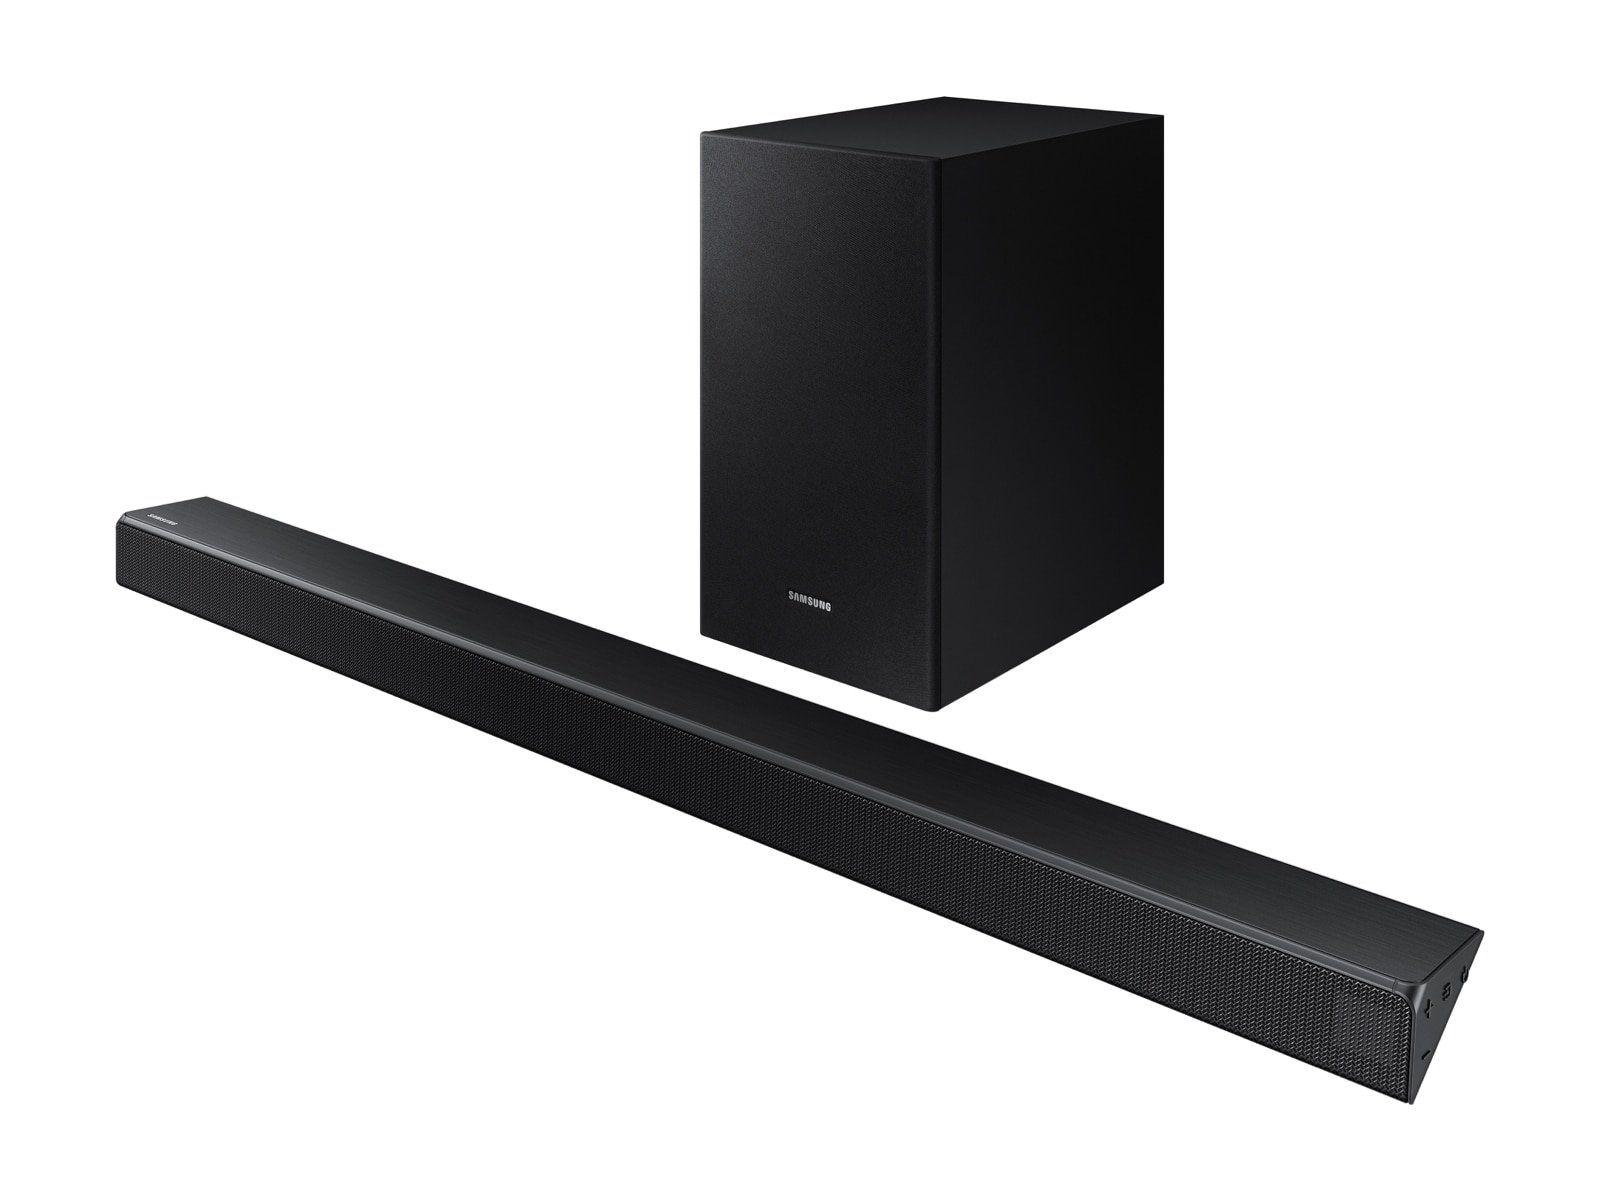 Pin By Nuria Rodrigues On Eletrodomesticos In 2020 Sound Bar Wireless Surround Sound Tv Sound